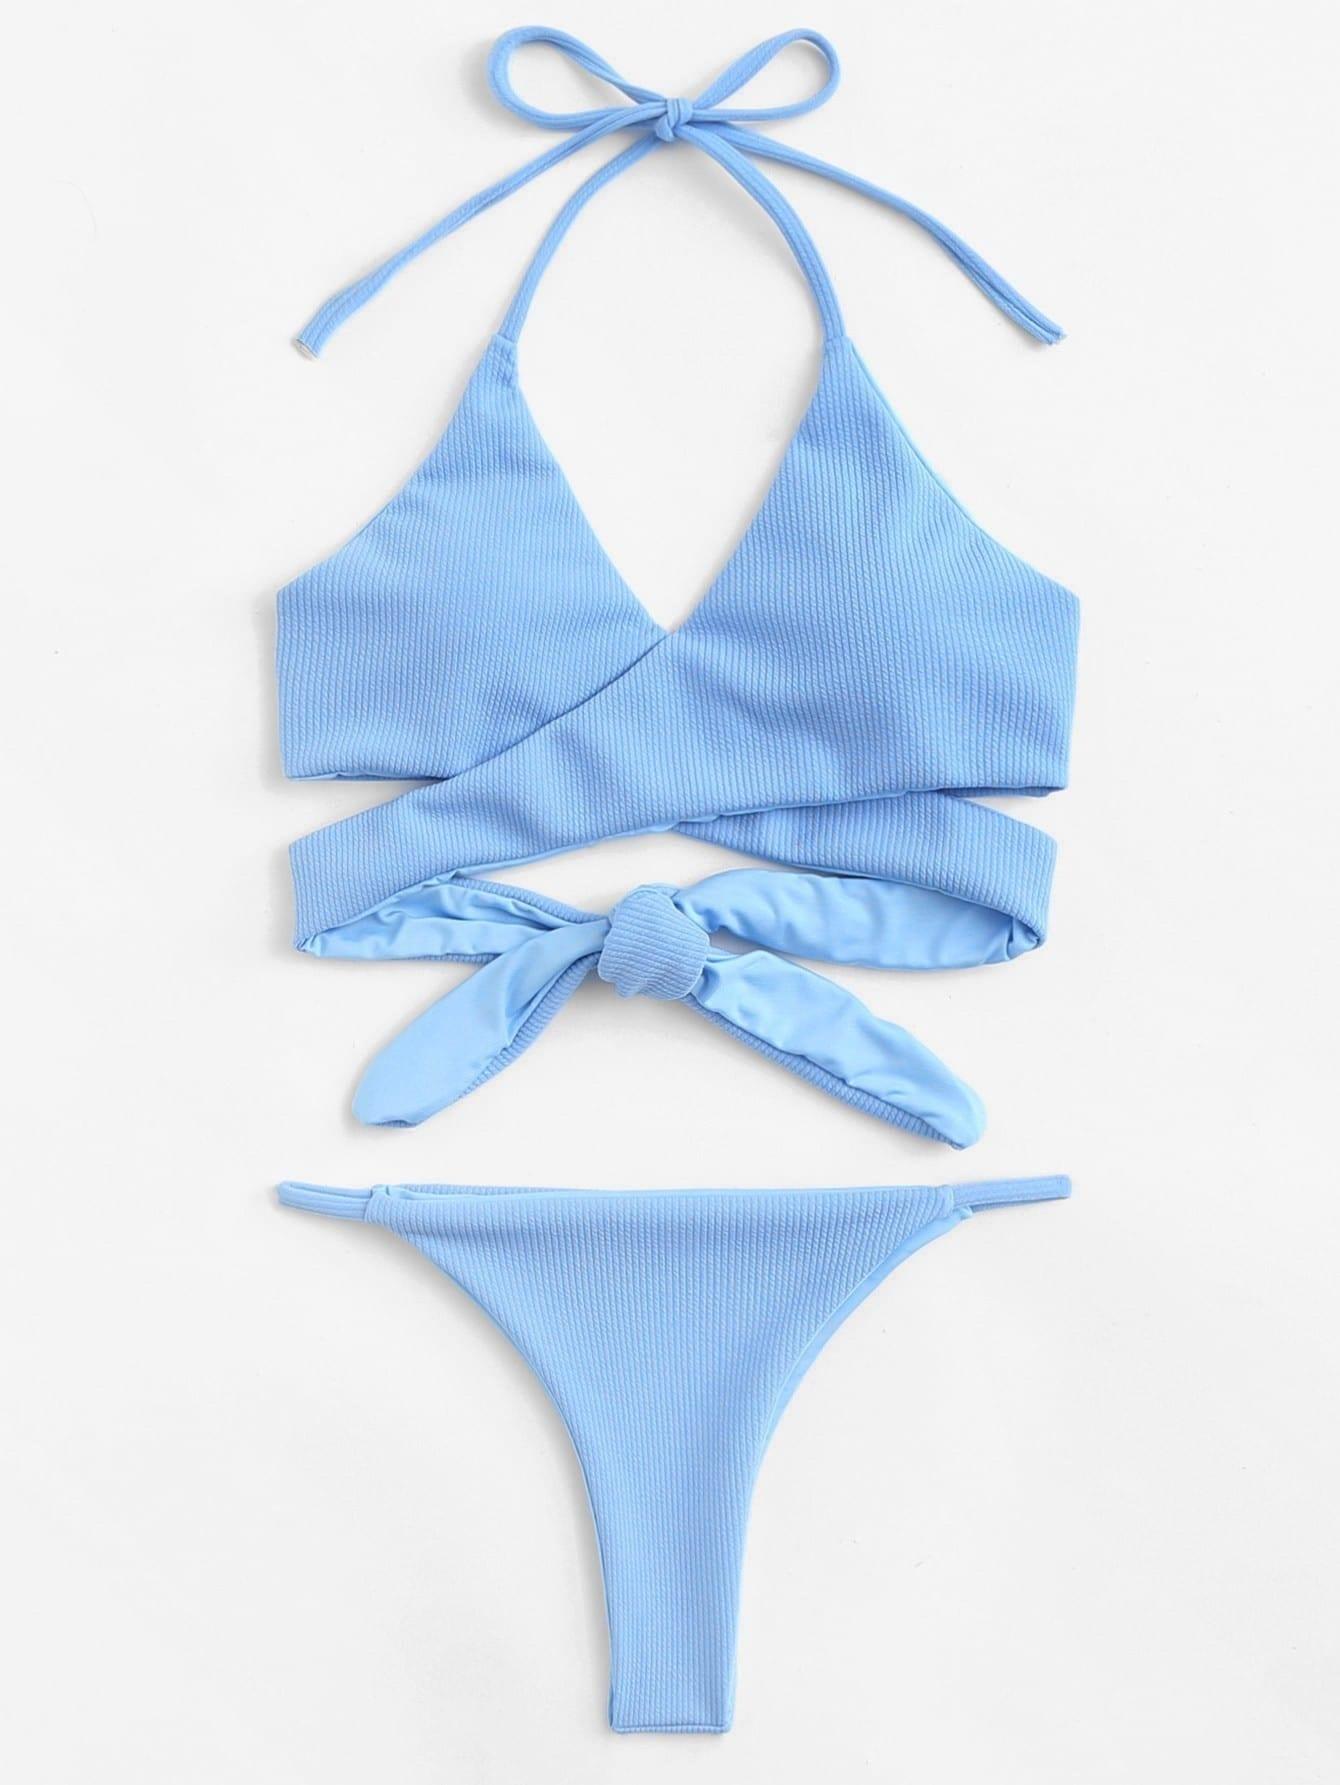 Wrap Knot Halter Bikini Set halter patterned wrap bikini